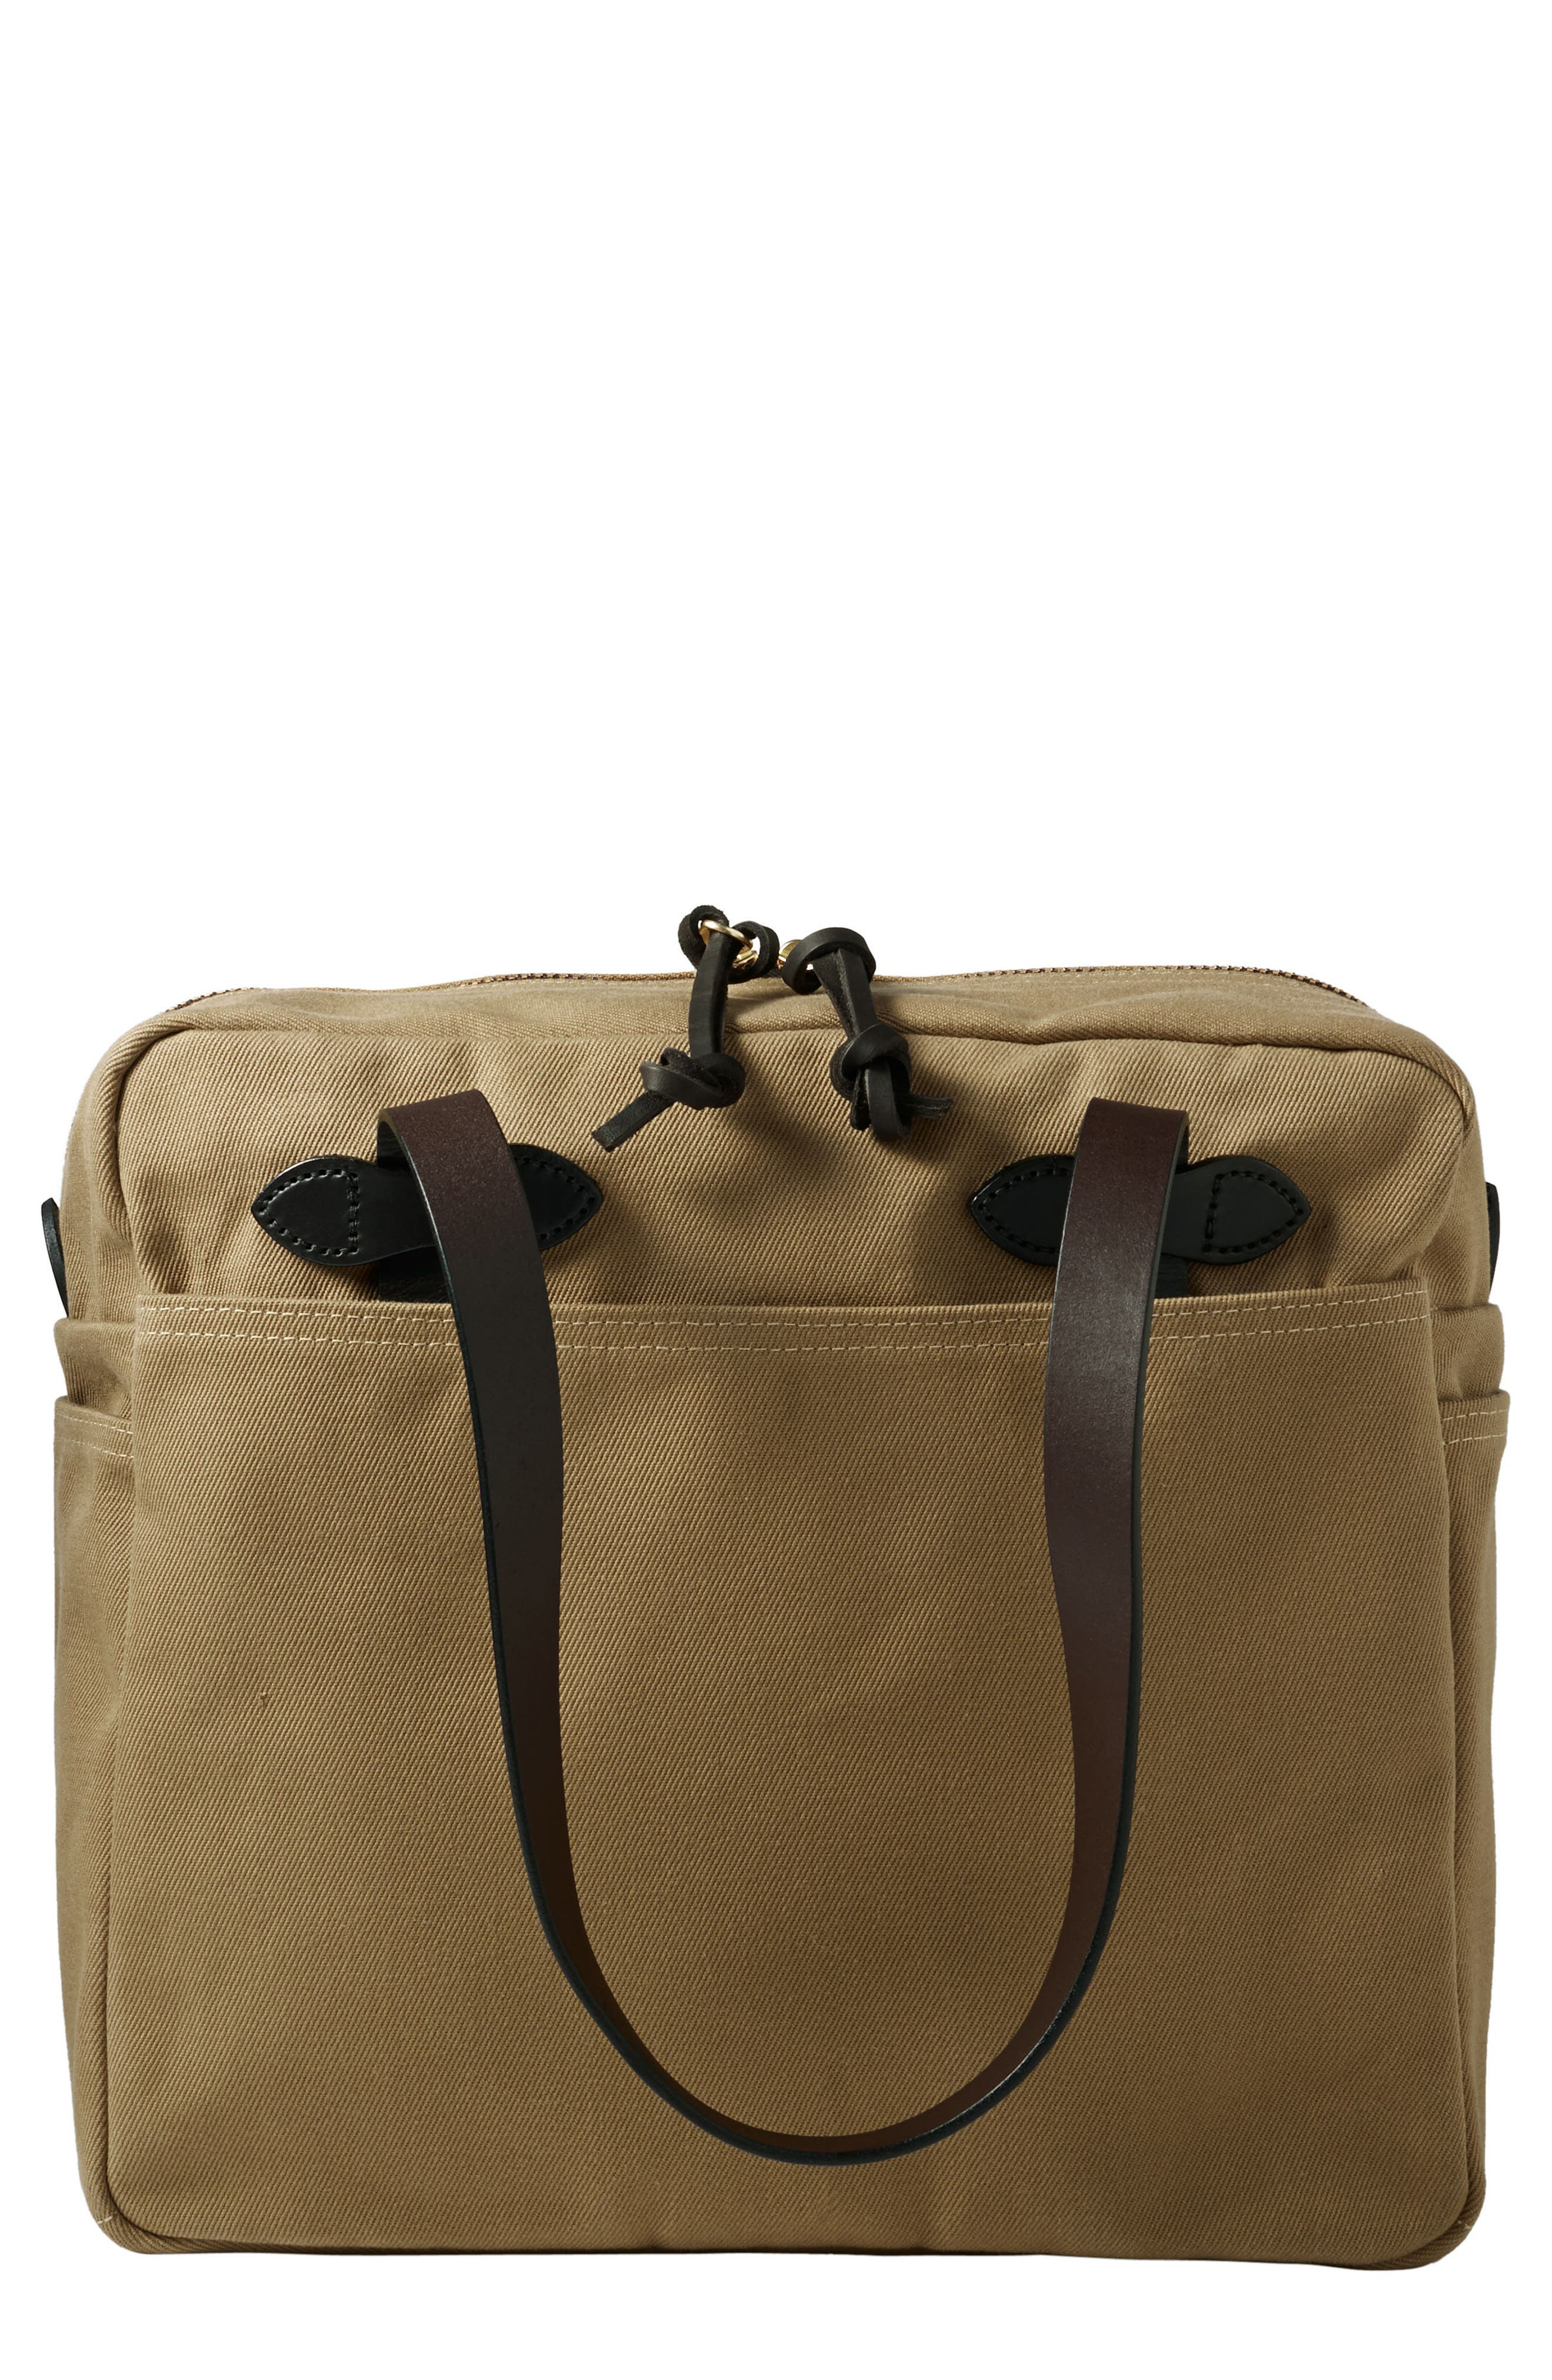 Rugged Twill Zip Tote Bag